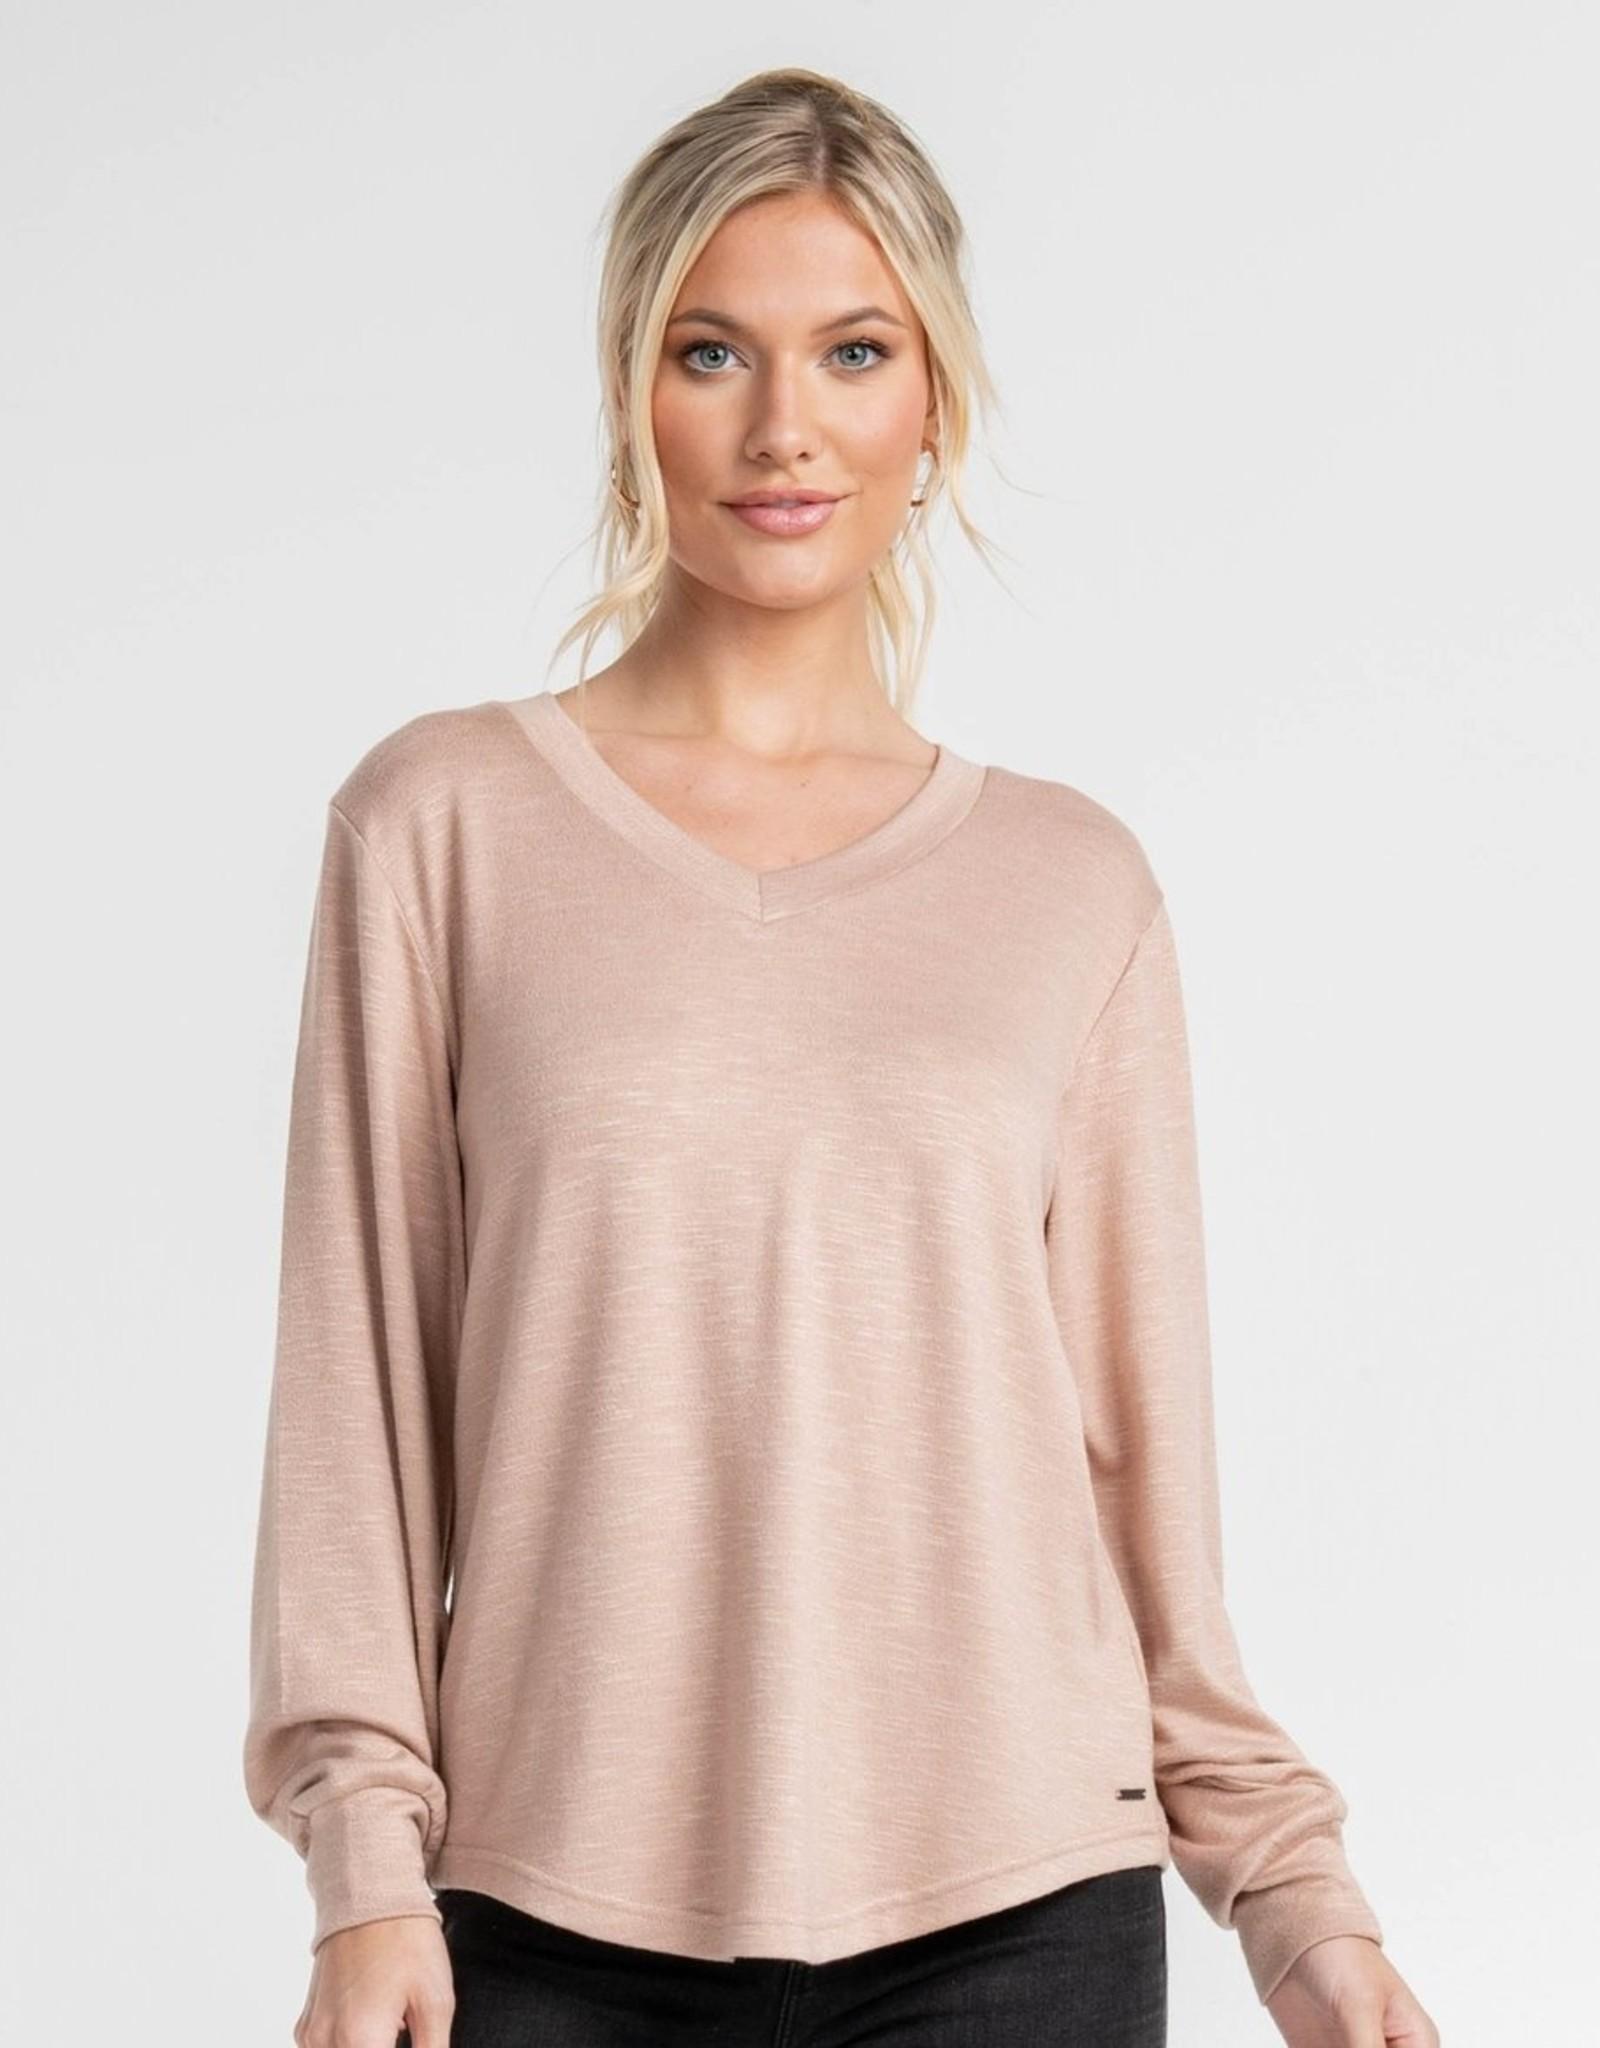 Southern Shirt Slub Knit Pullover